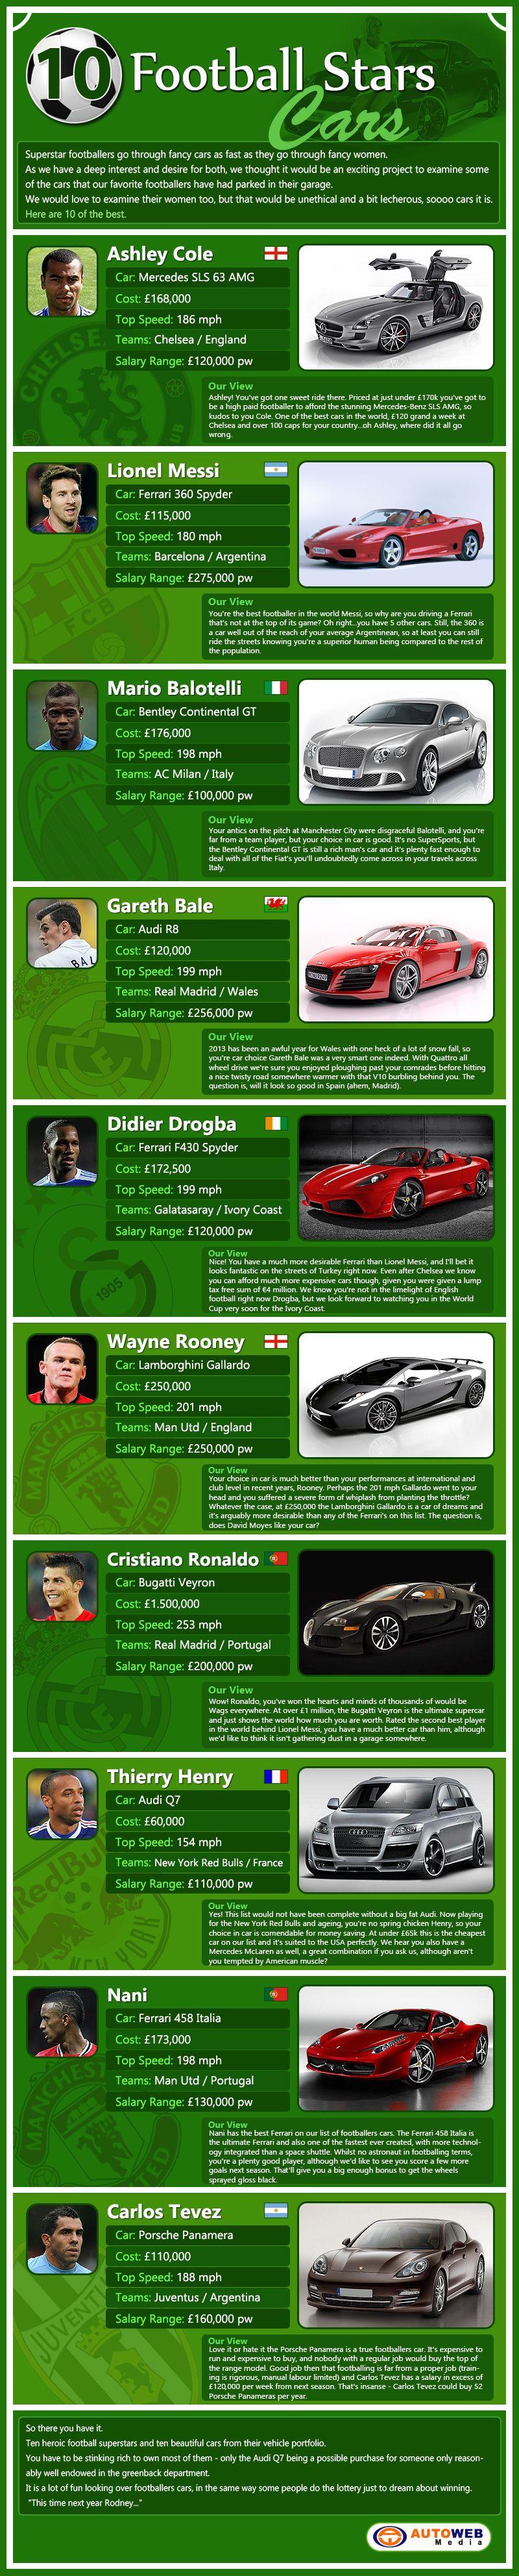 Football-Stars-Cars-infographic